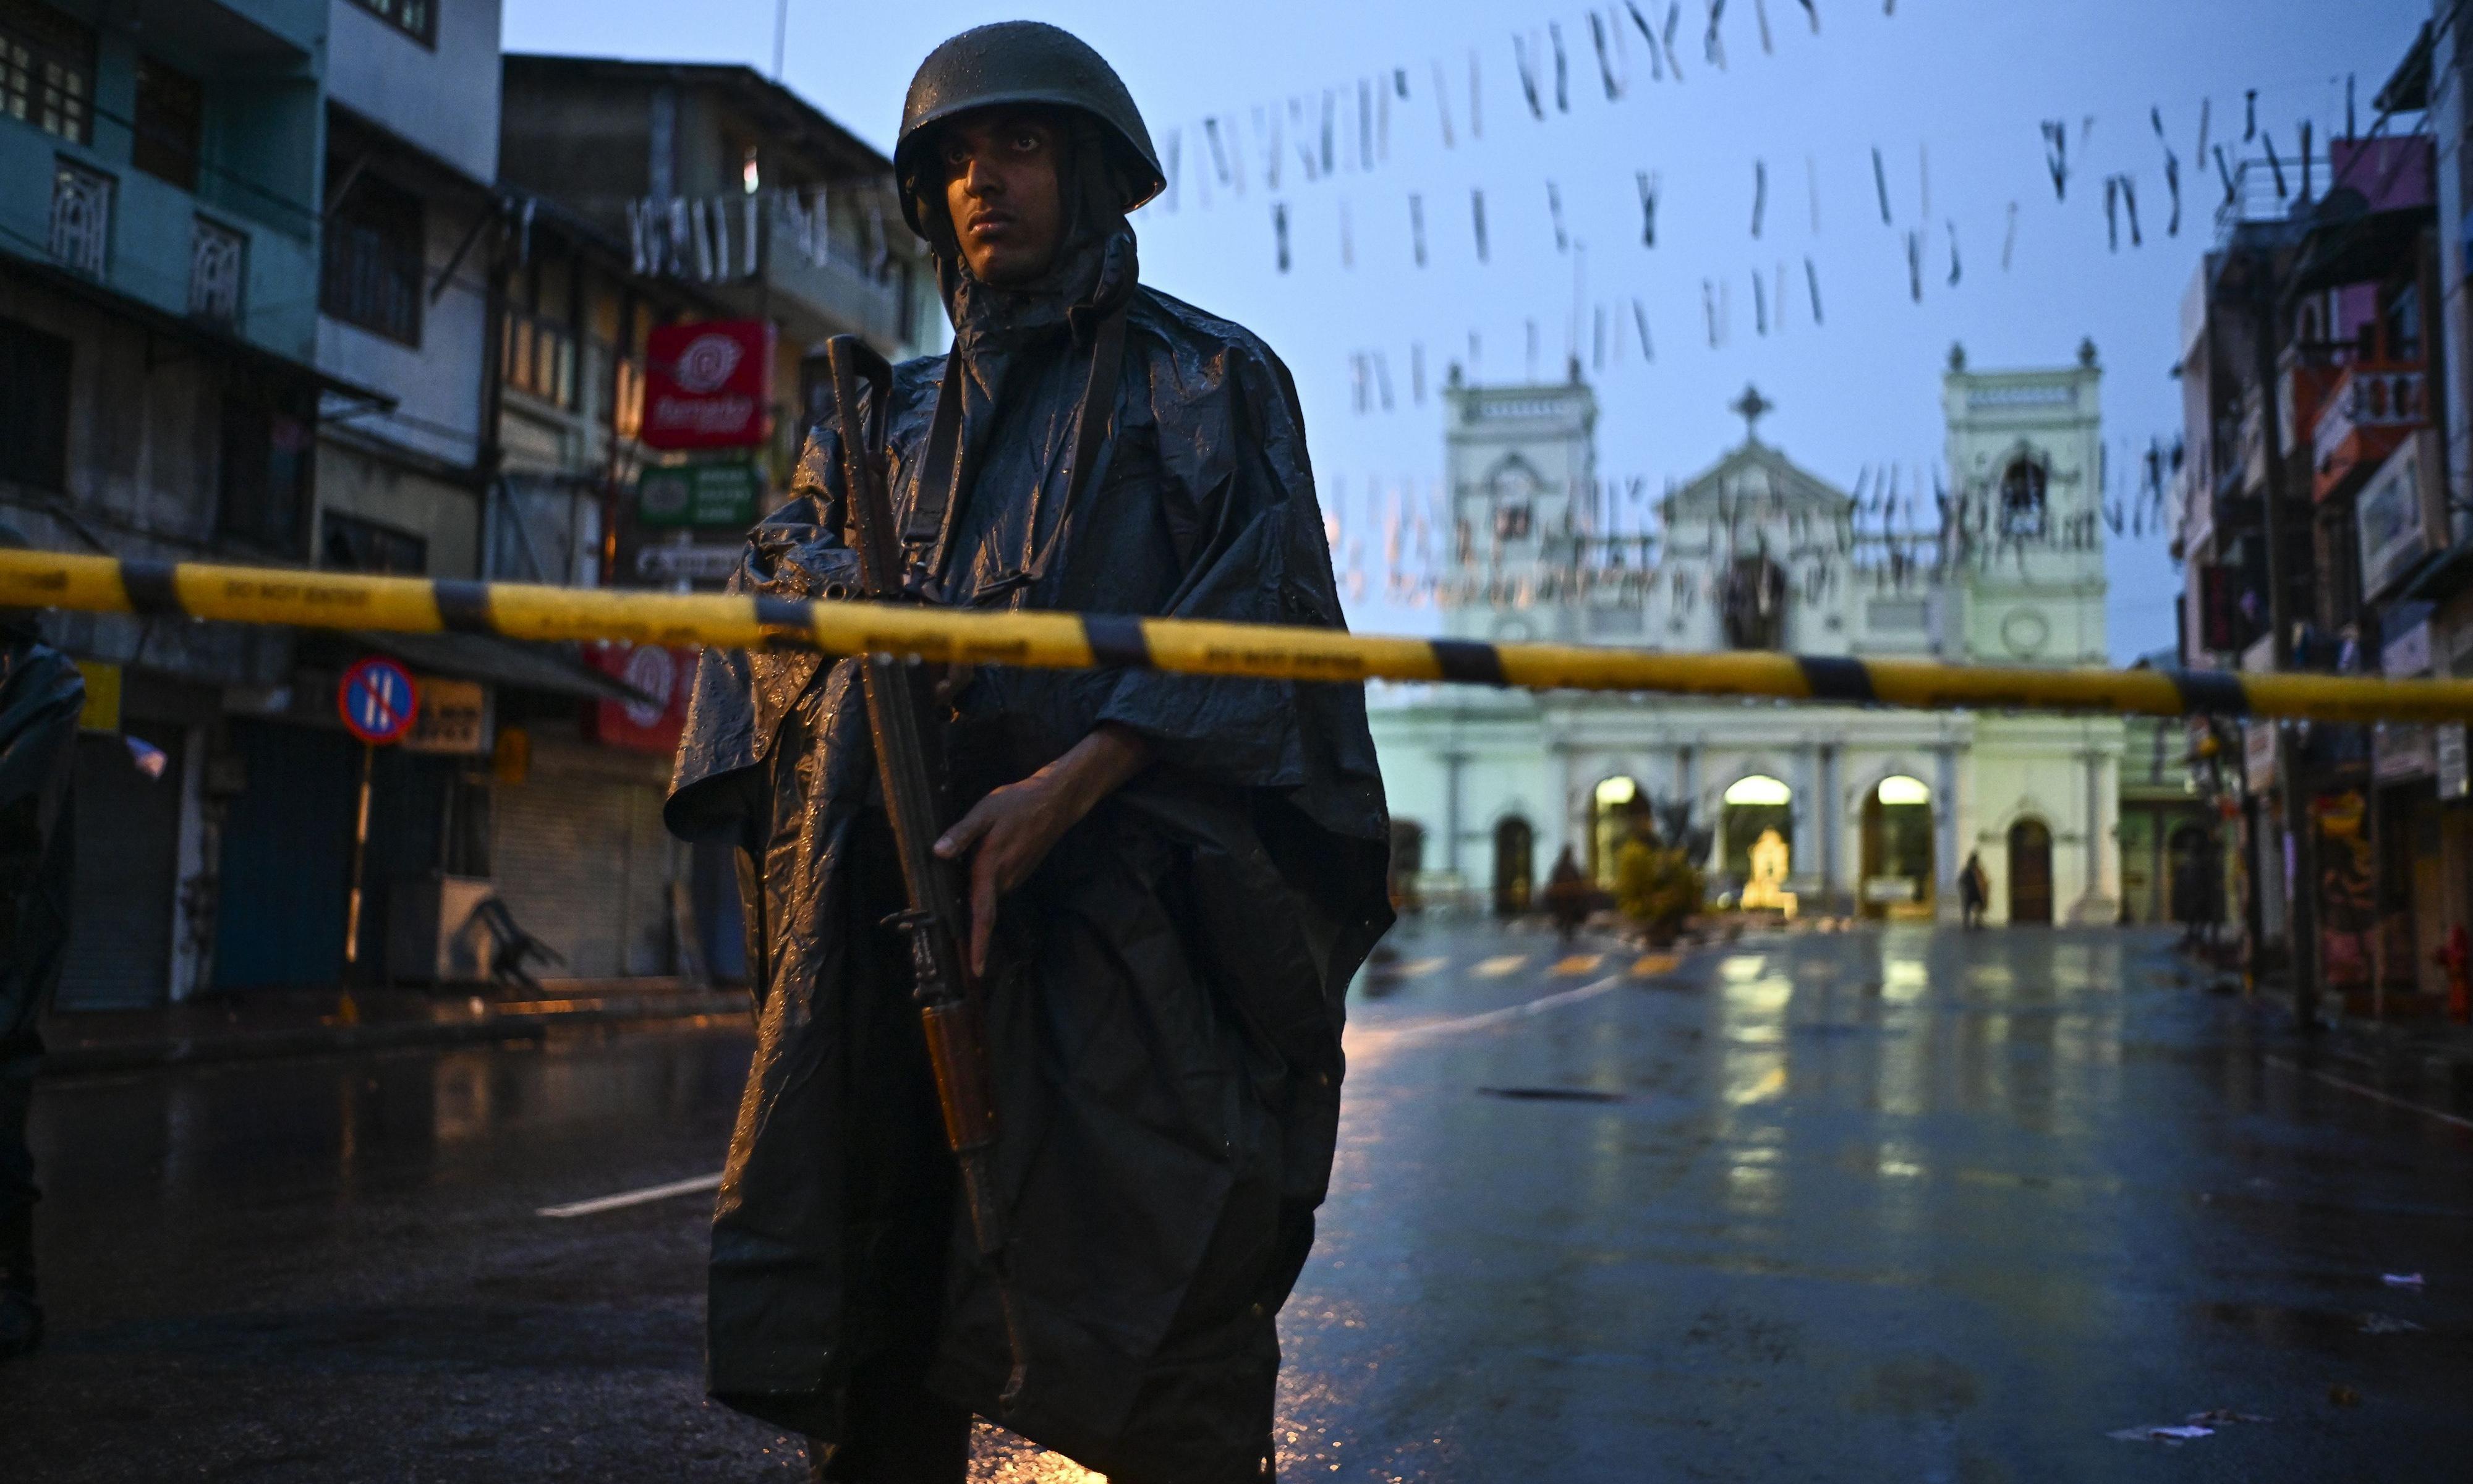 Sri Lanka attacks: police hunting 140 Isis suspects, says president